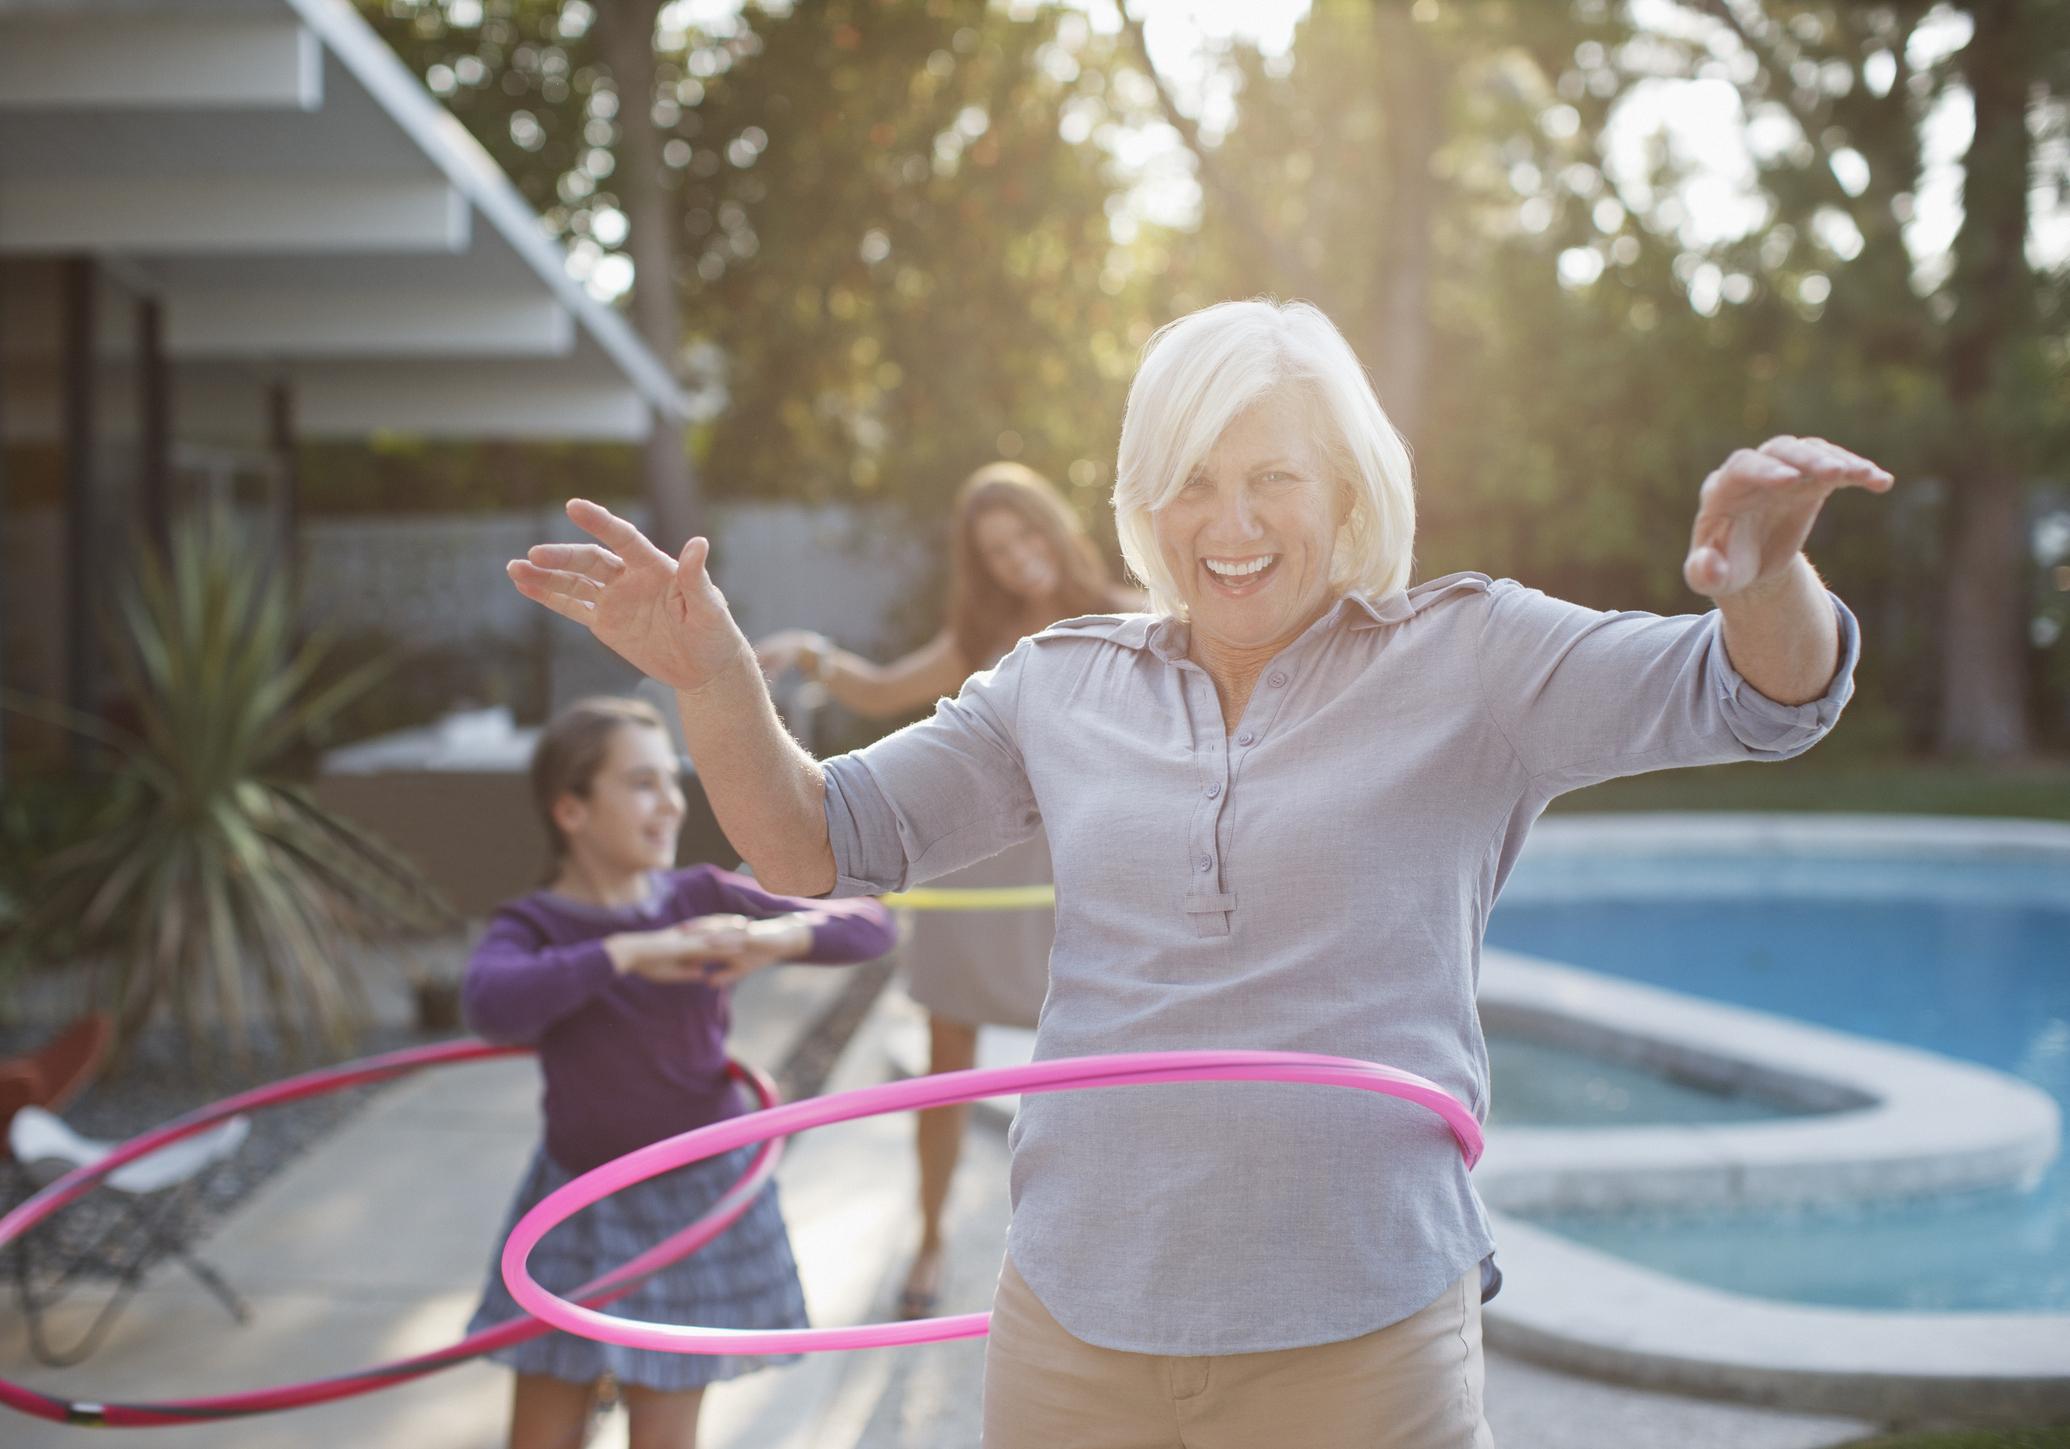 A happy senior woman by a pool uses a hula hoop.